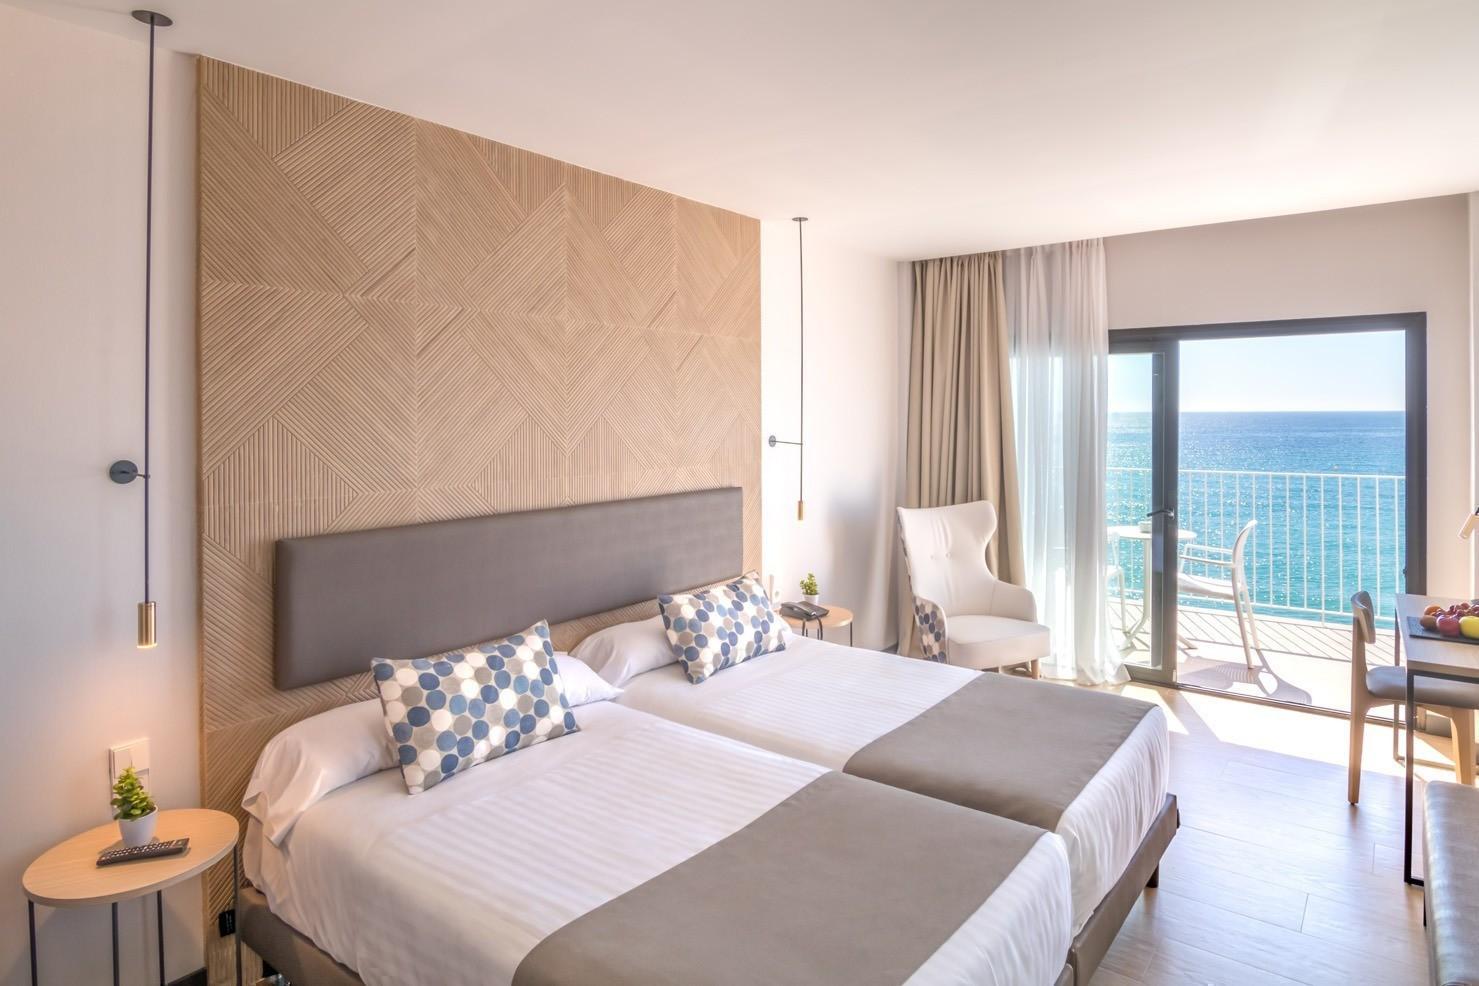 hotels/hotel_34/image_7.jpg